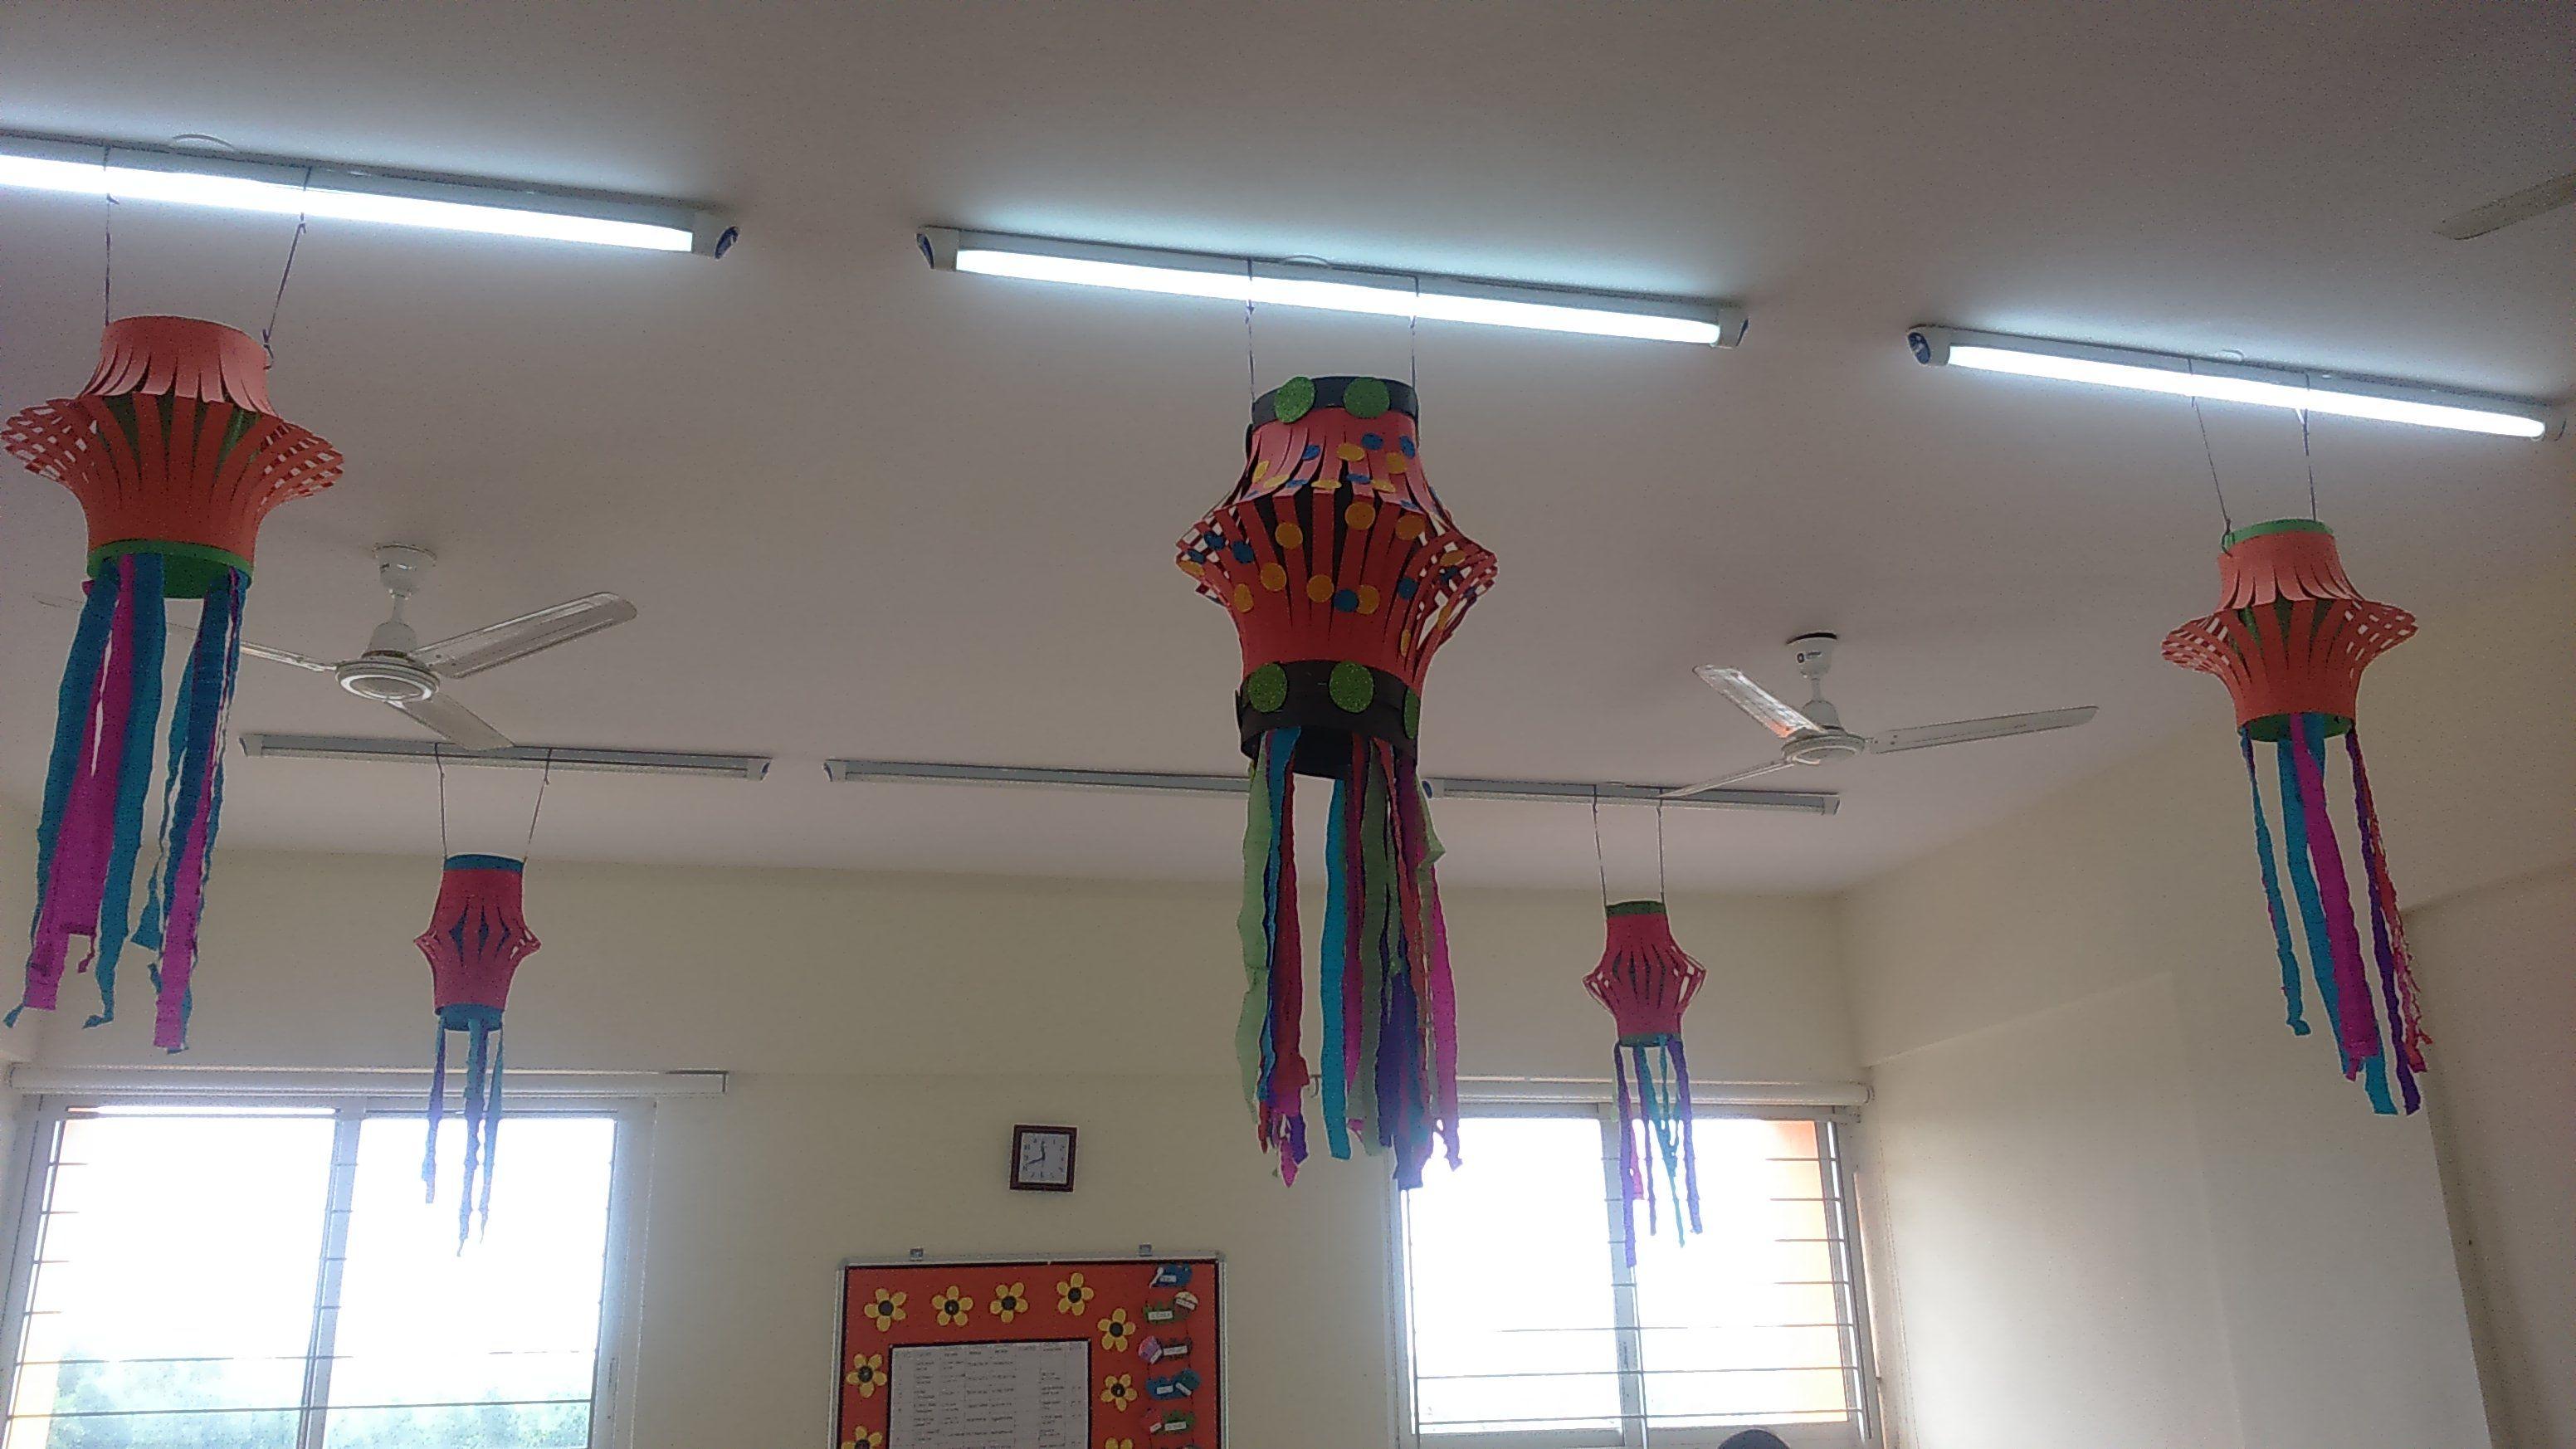 Classroom Decoration Ideas For Diwali : Lkg class decoration for diwali creative classroom